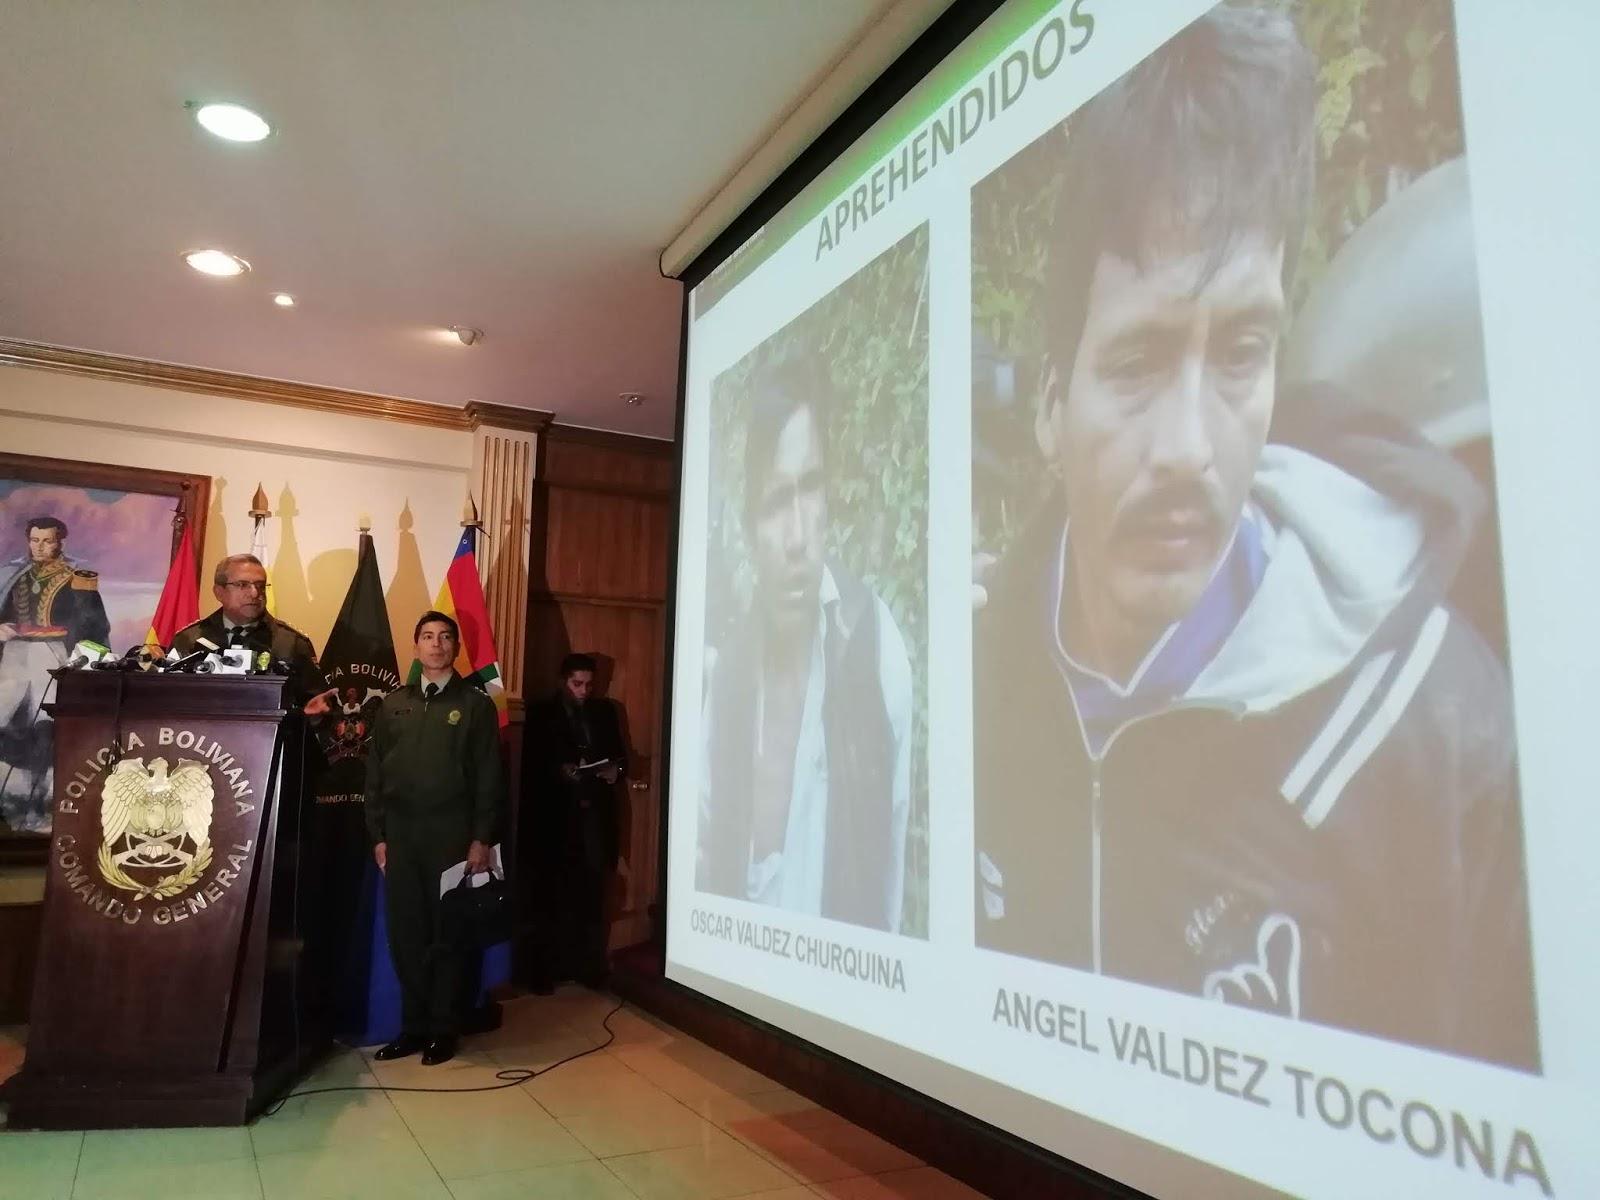 Comando policial presentó a dos sujetos encontrados con armas de fuego / ABI